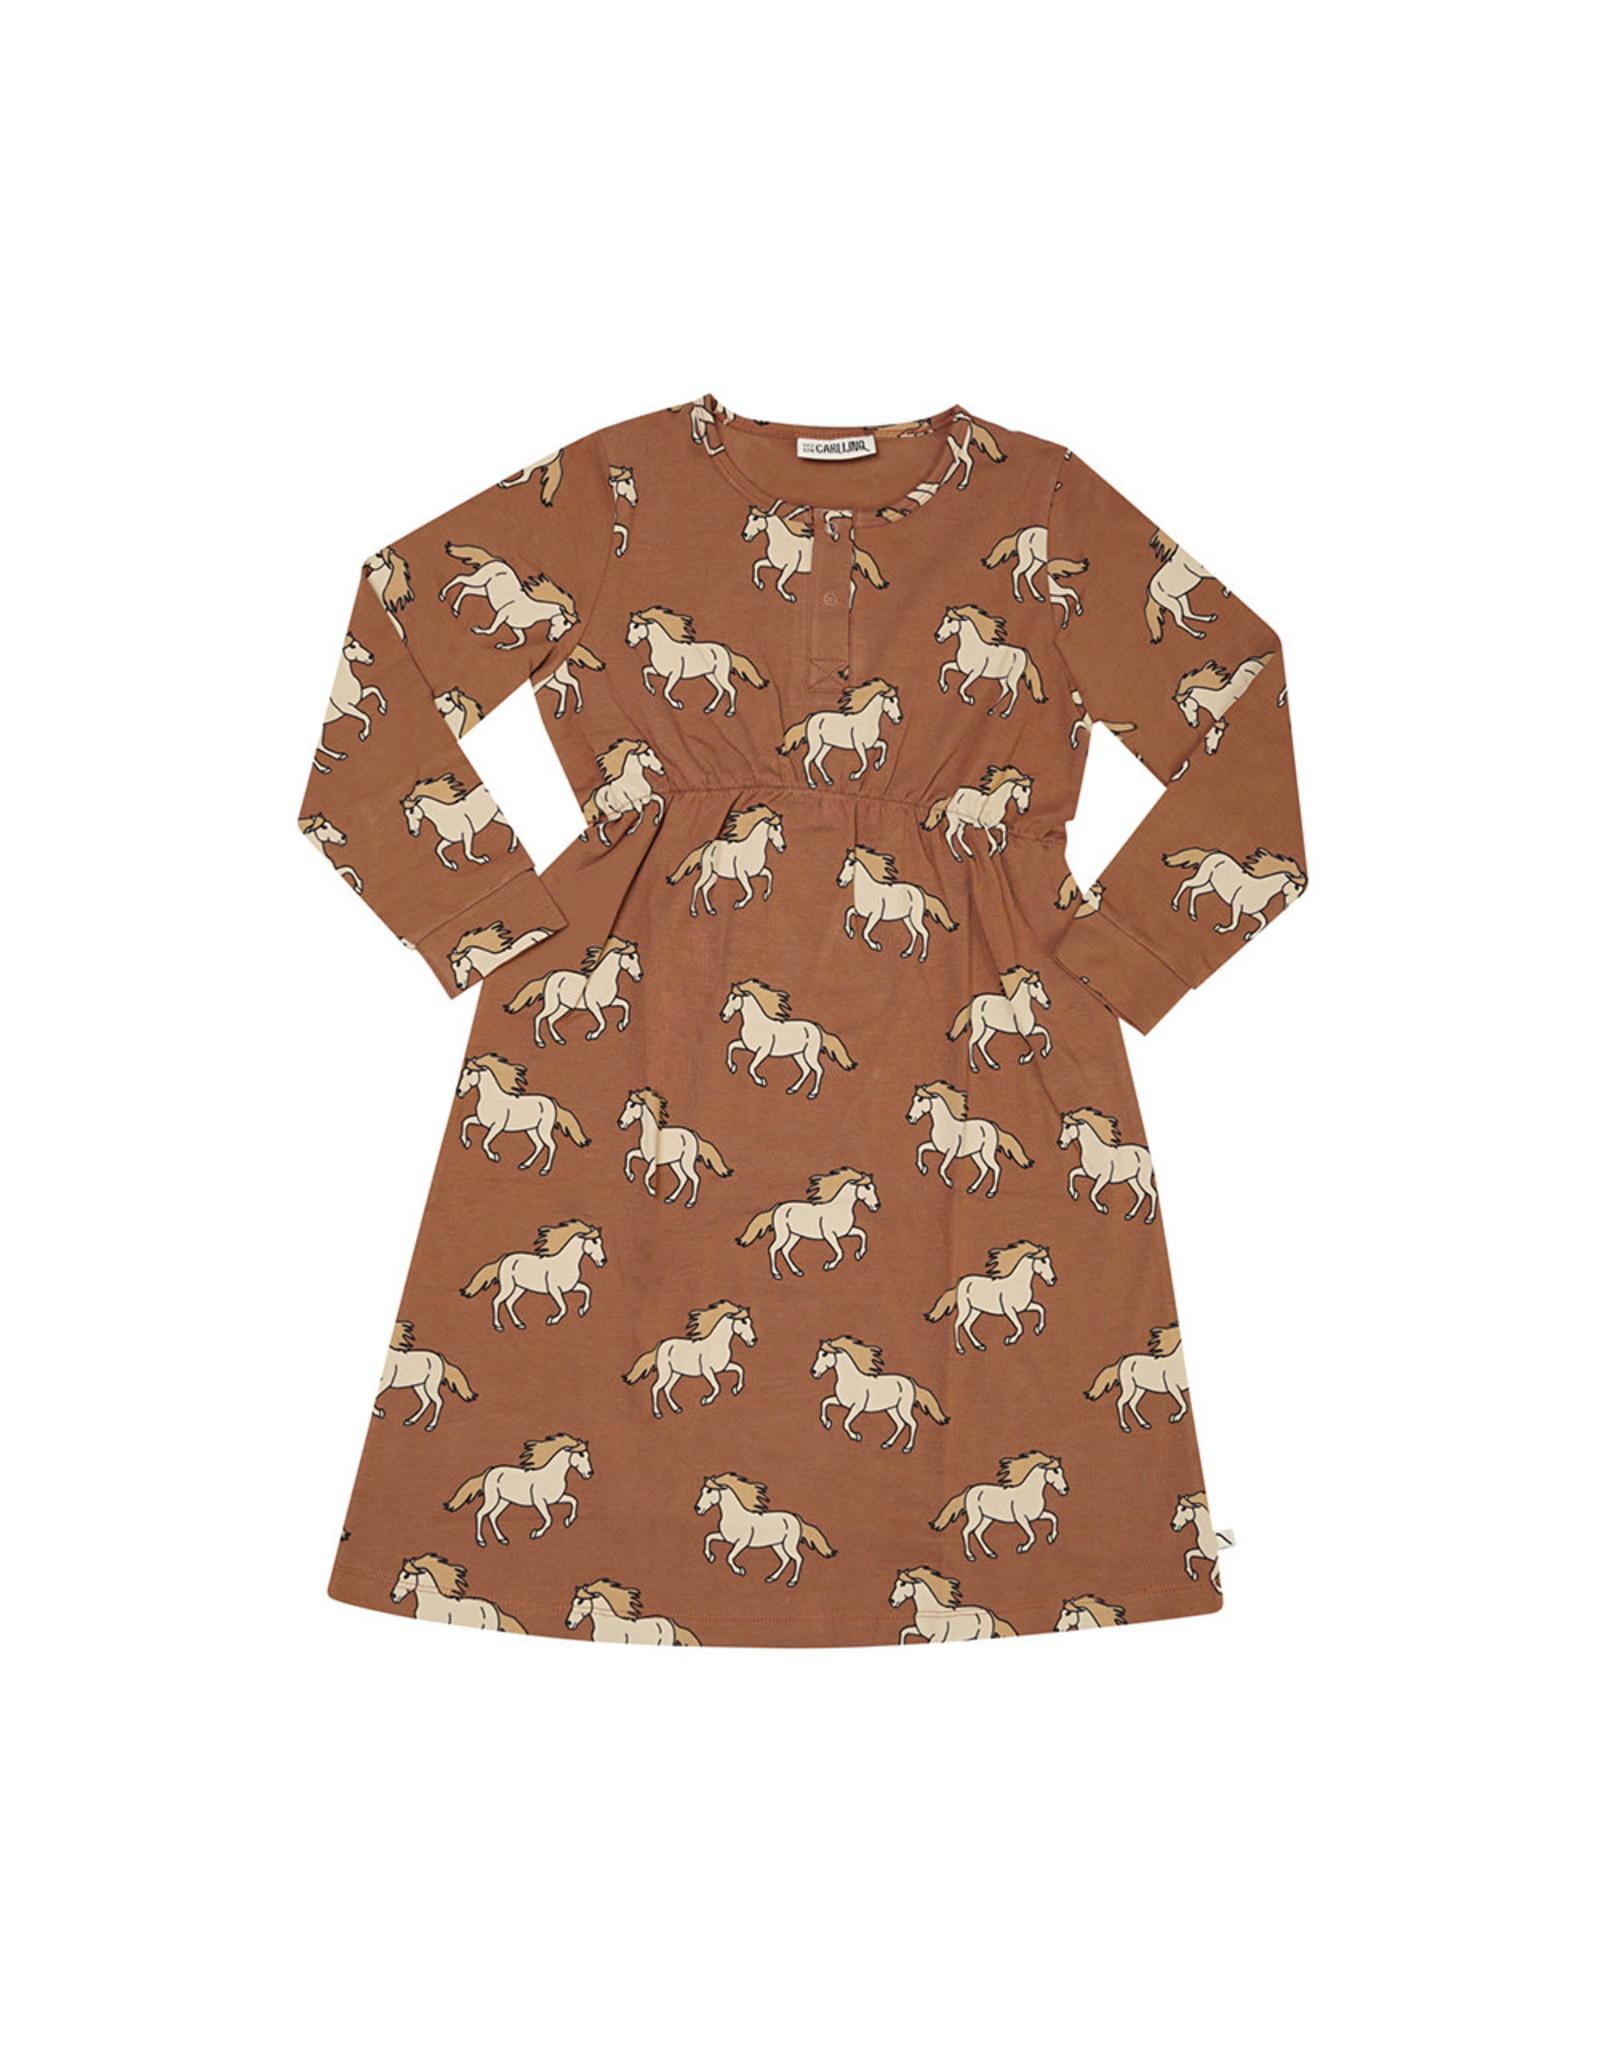 Carlijn Q Carlijn Q Wild Horse - 2 Button Dress